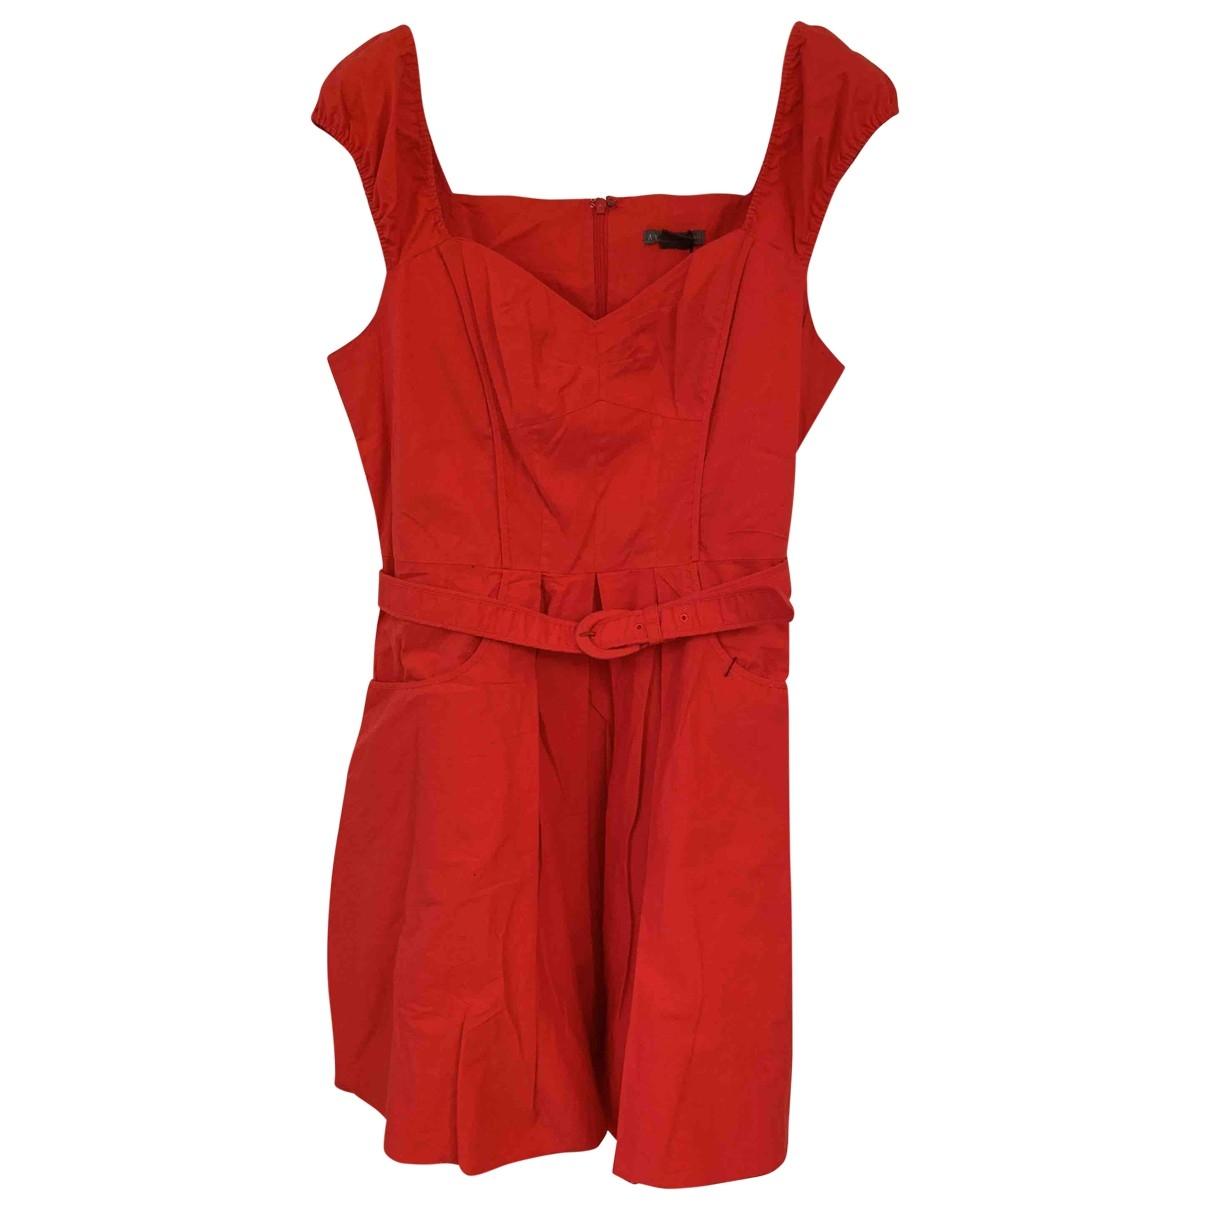 Emporio Armani - Robe   pour femme en coton - rouge